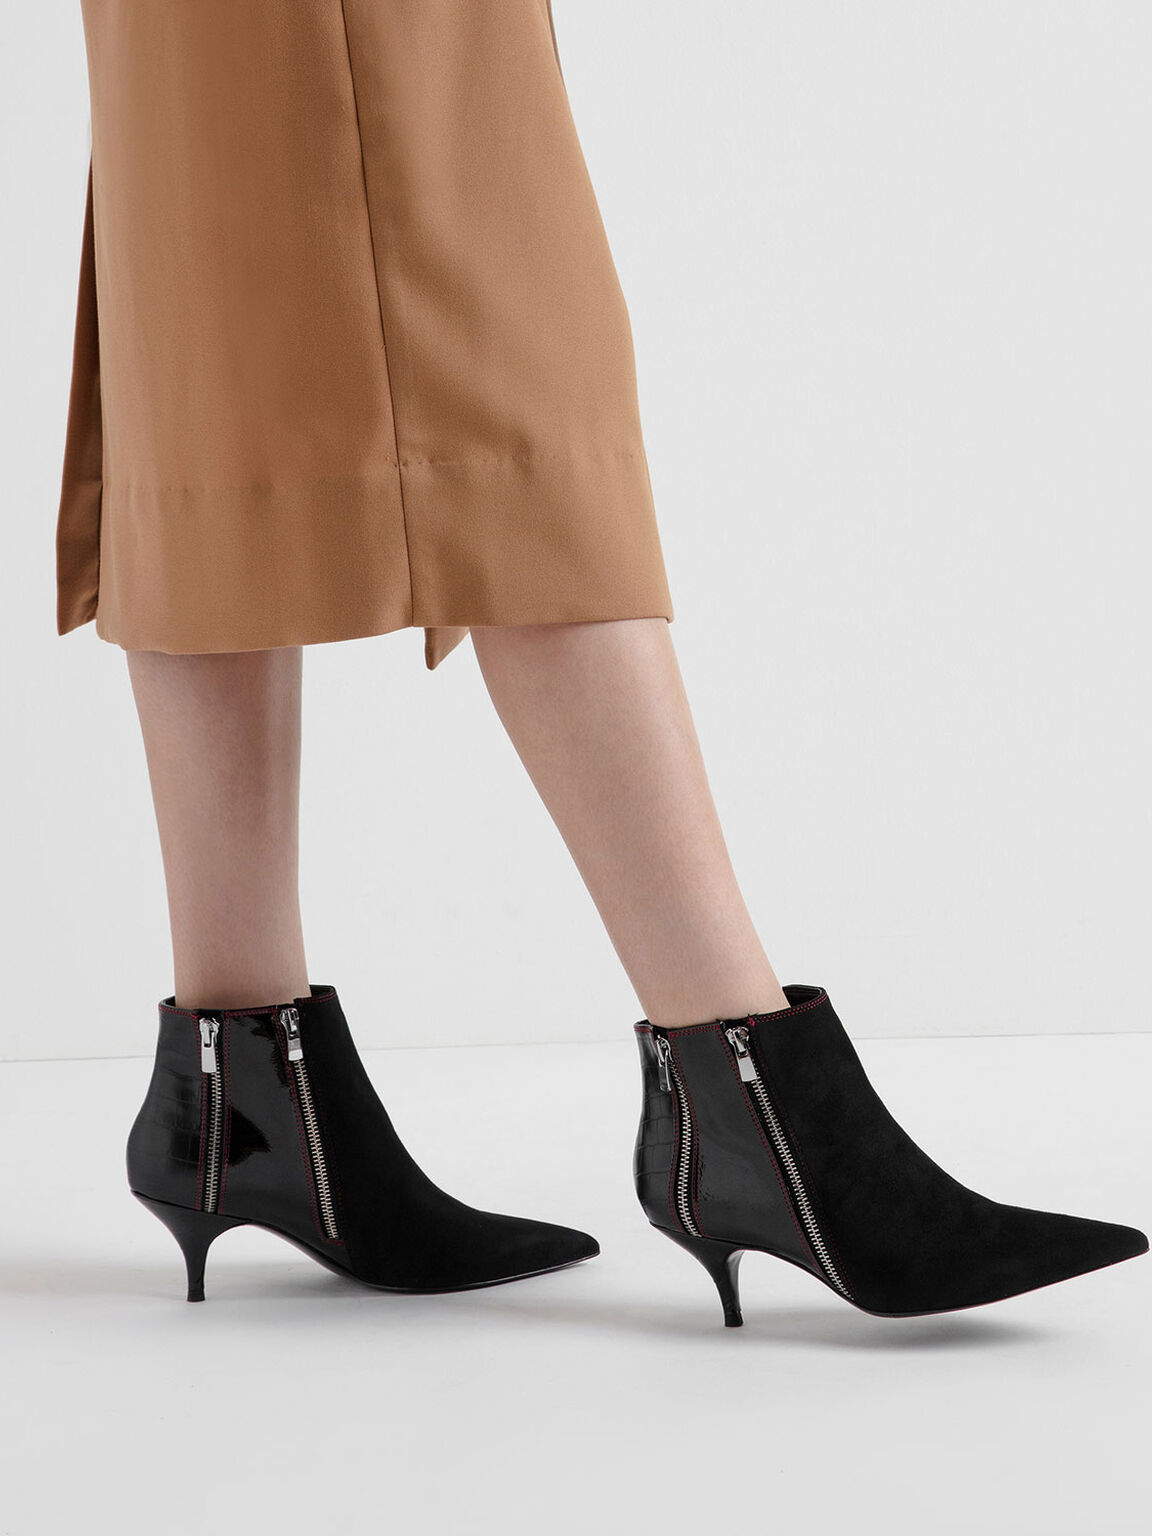 Croc-Effect Wrinkled Patent Zip-Up Kitten Heel Ankle Boots, Black, hi-res